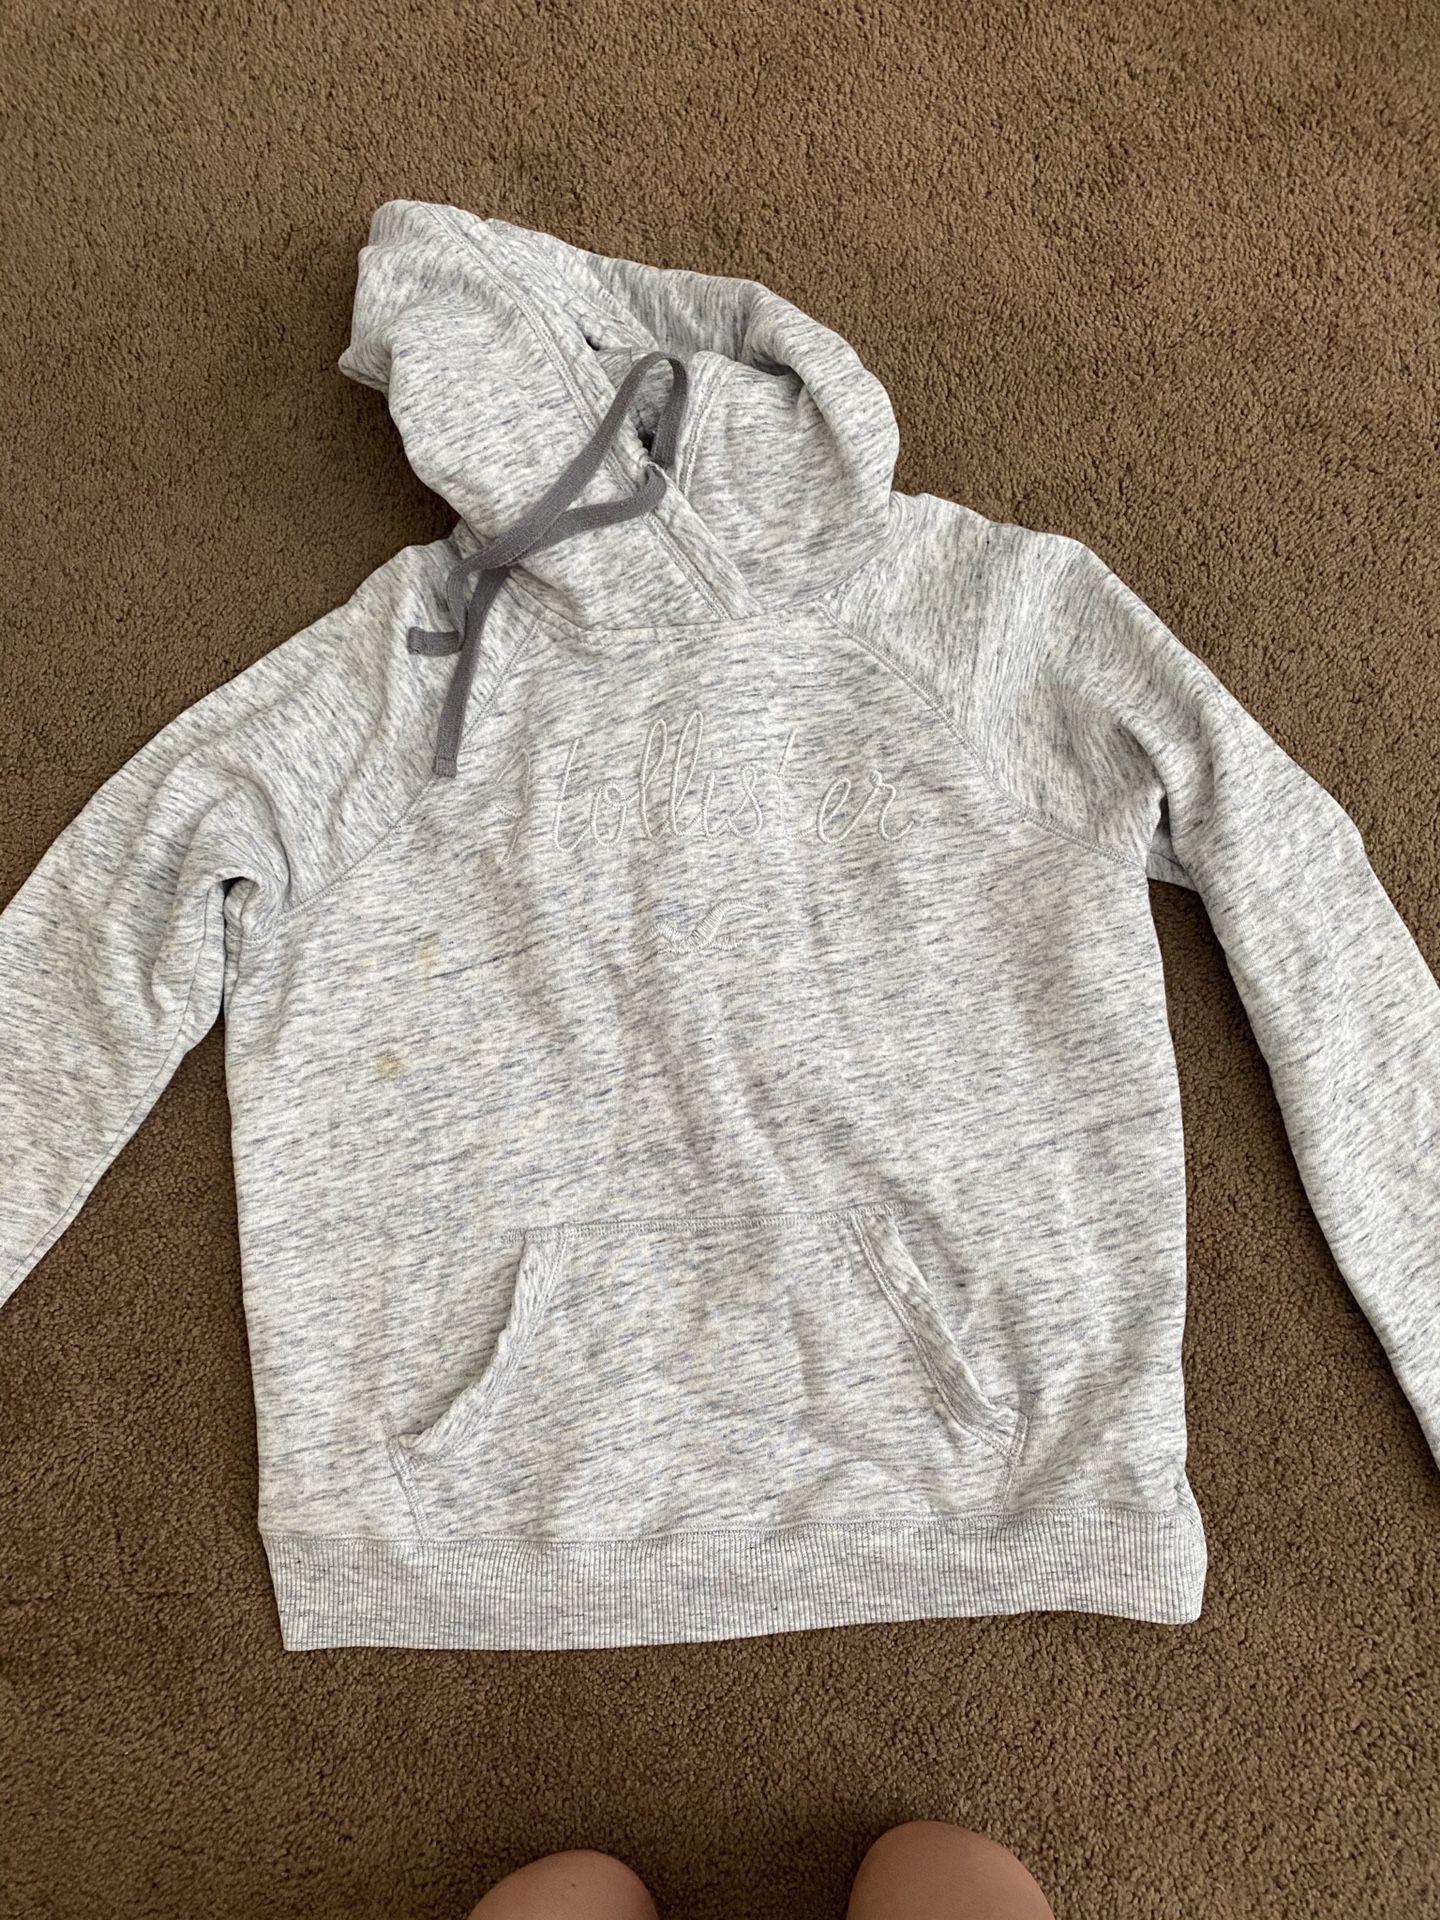 Hollister Sweatshirt!